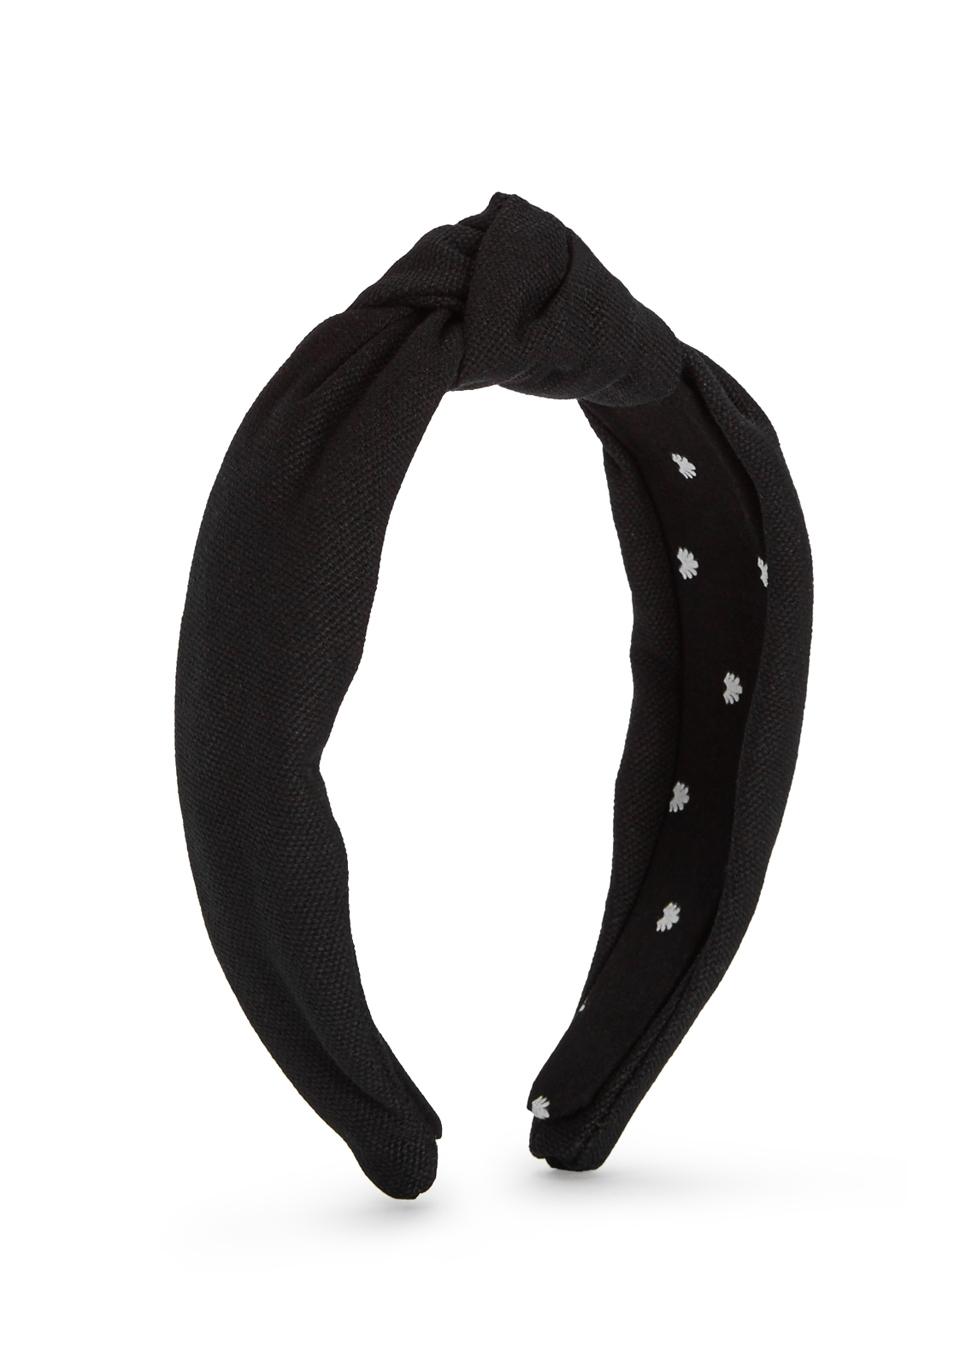 8b652ed9 Lele Sadoughi Black cotton headband - Harvey Nichols